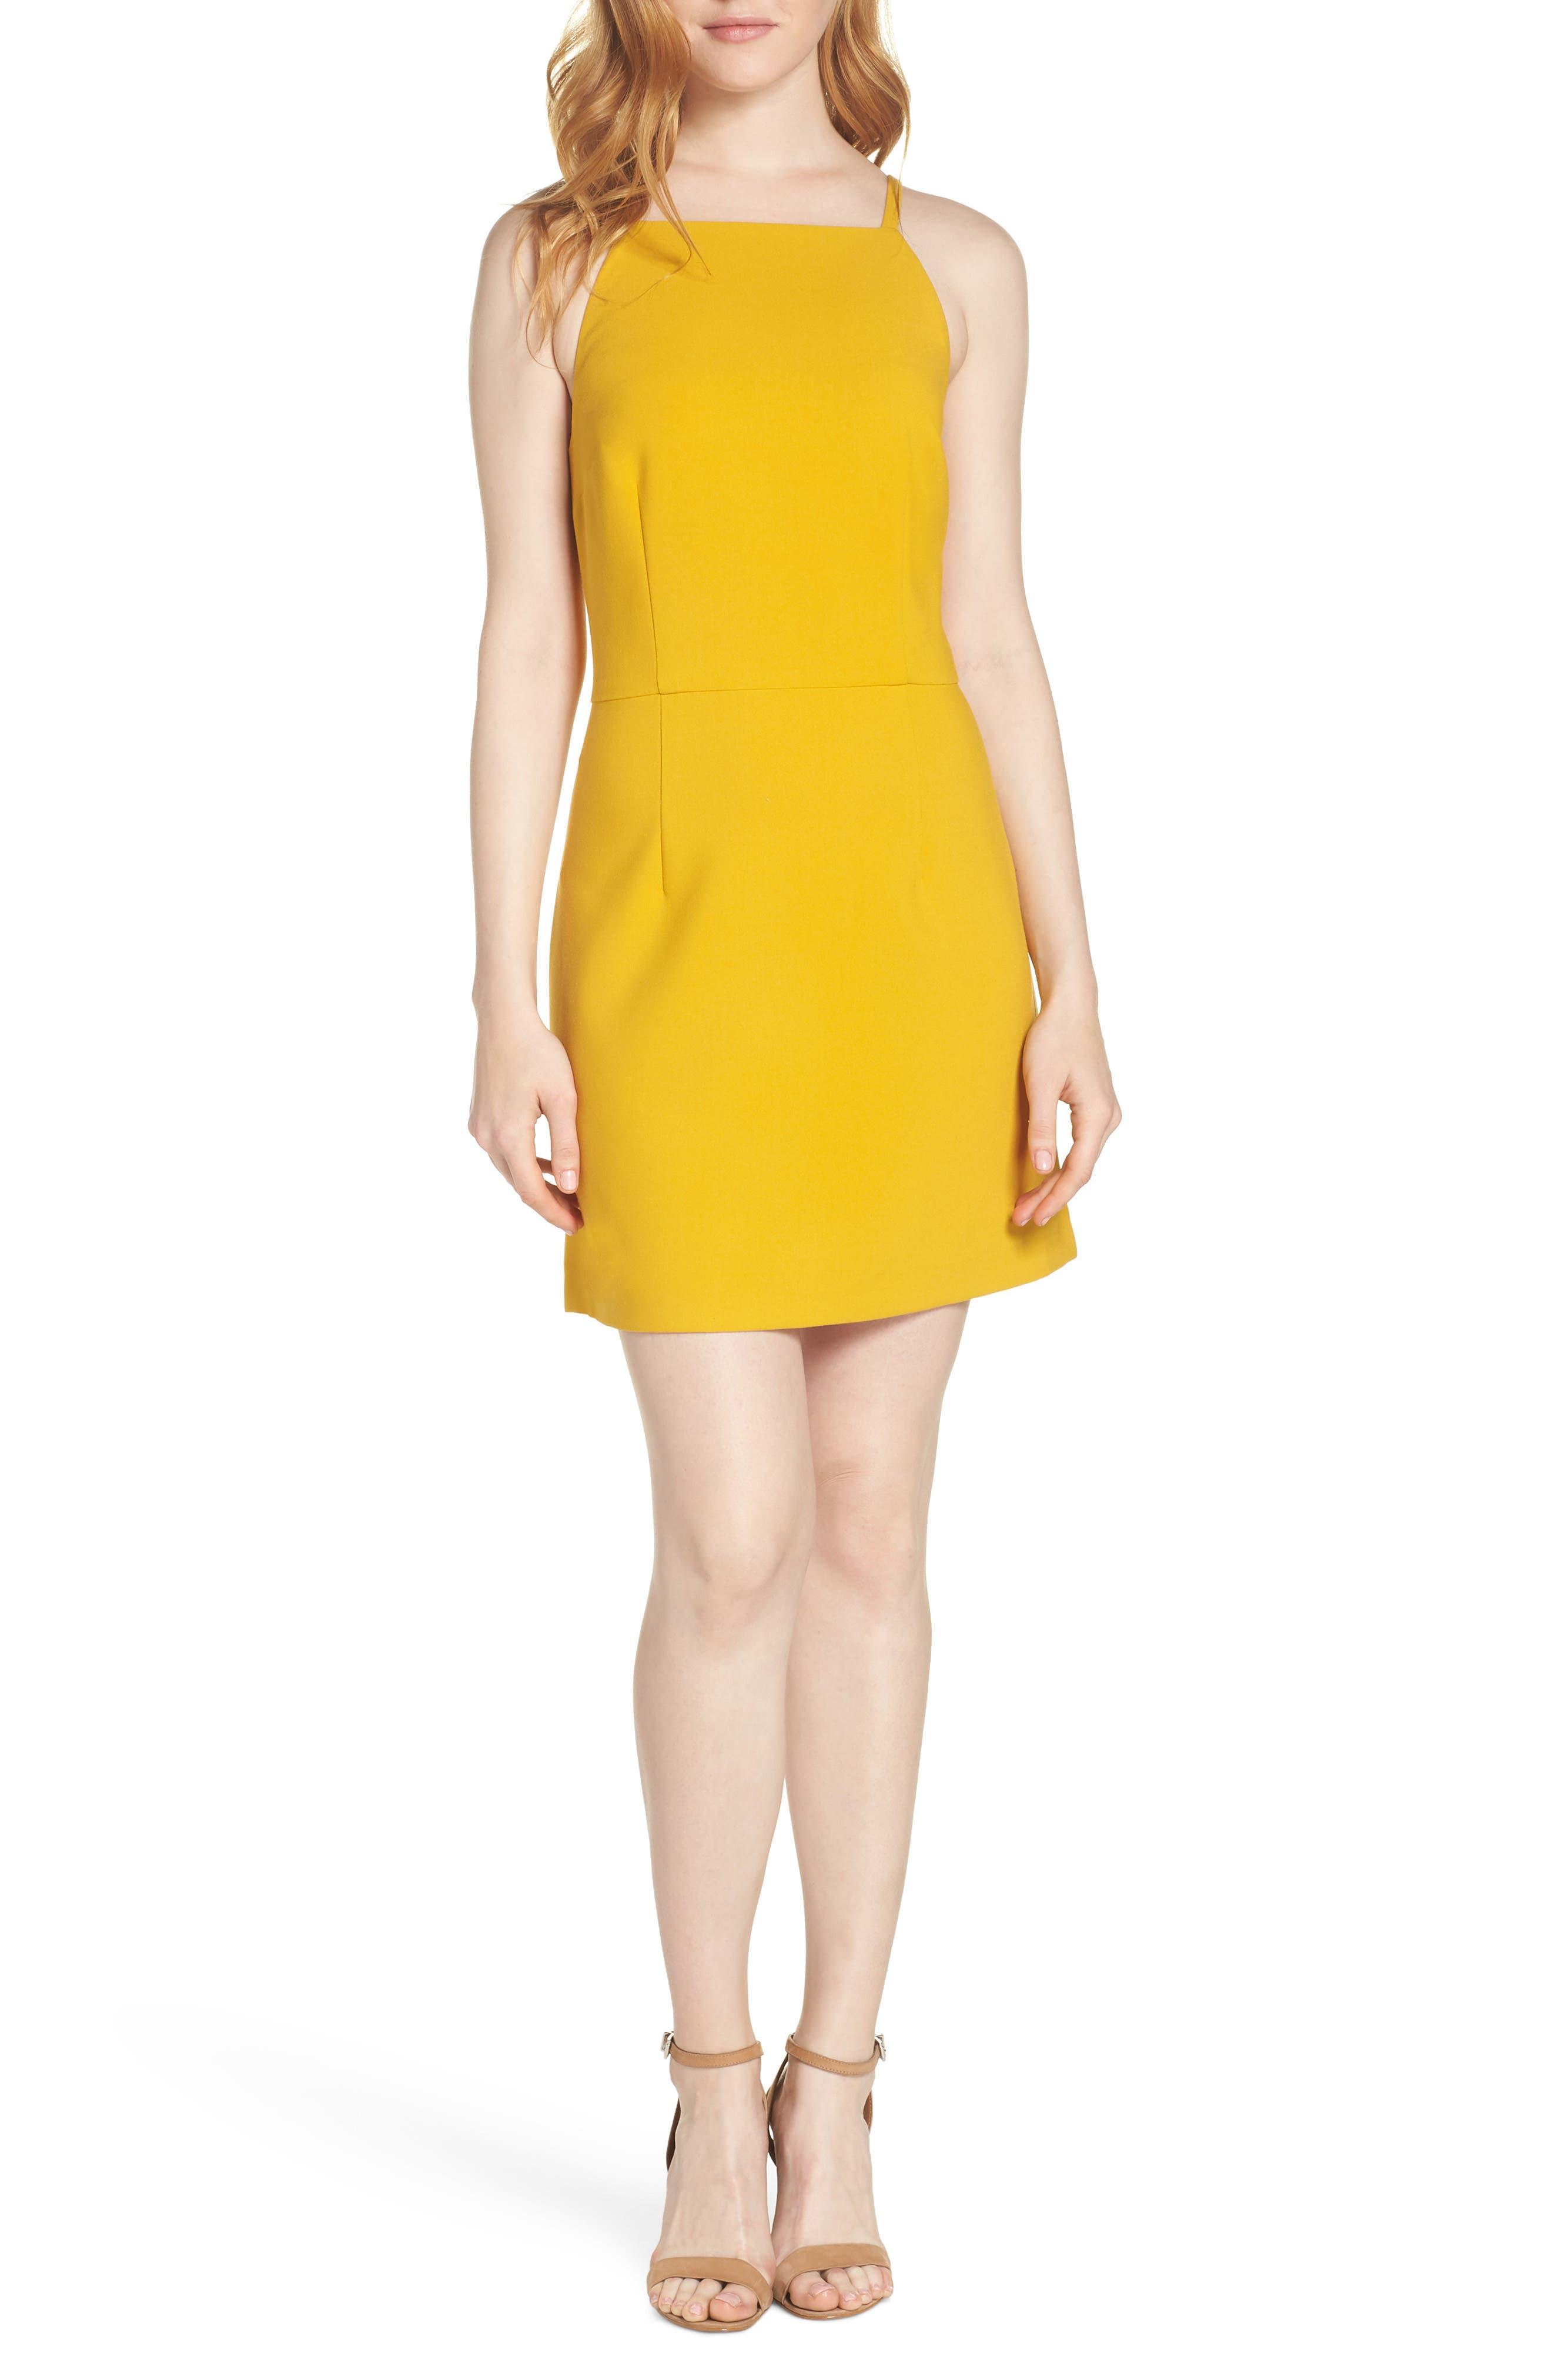 French Connection Whisper Light Sheath Minidress, Yellow